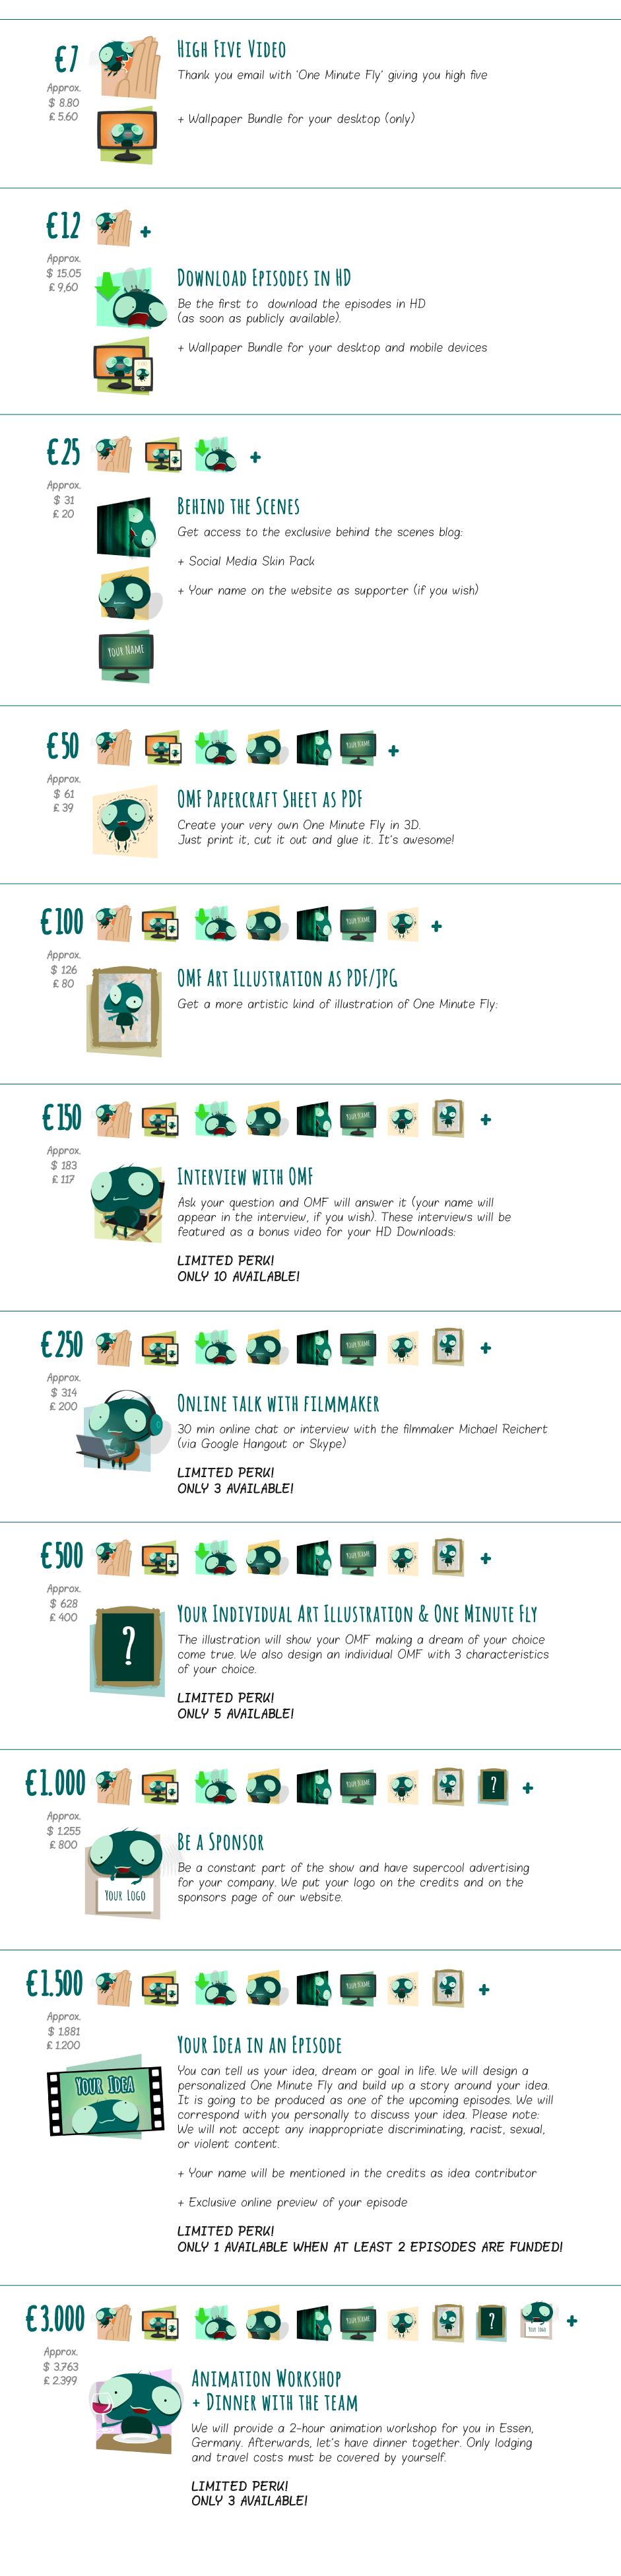 Reward List